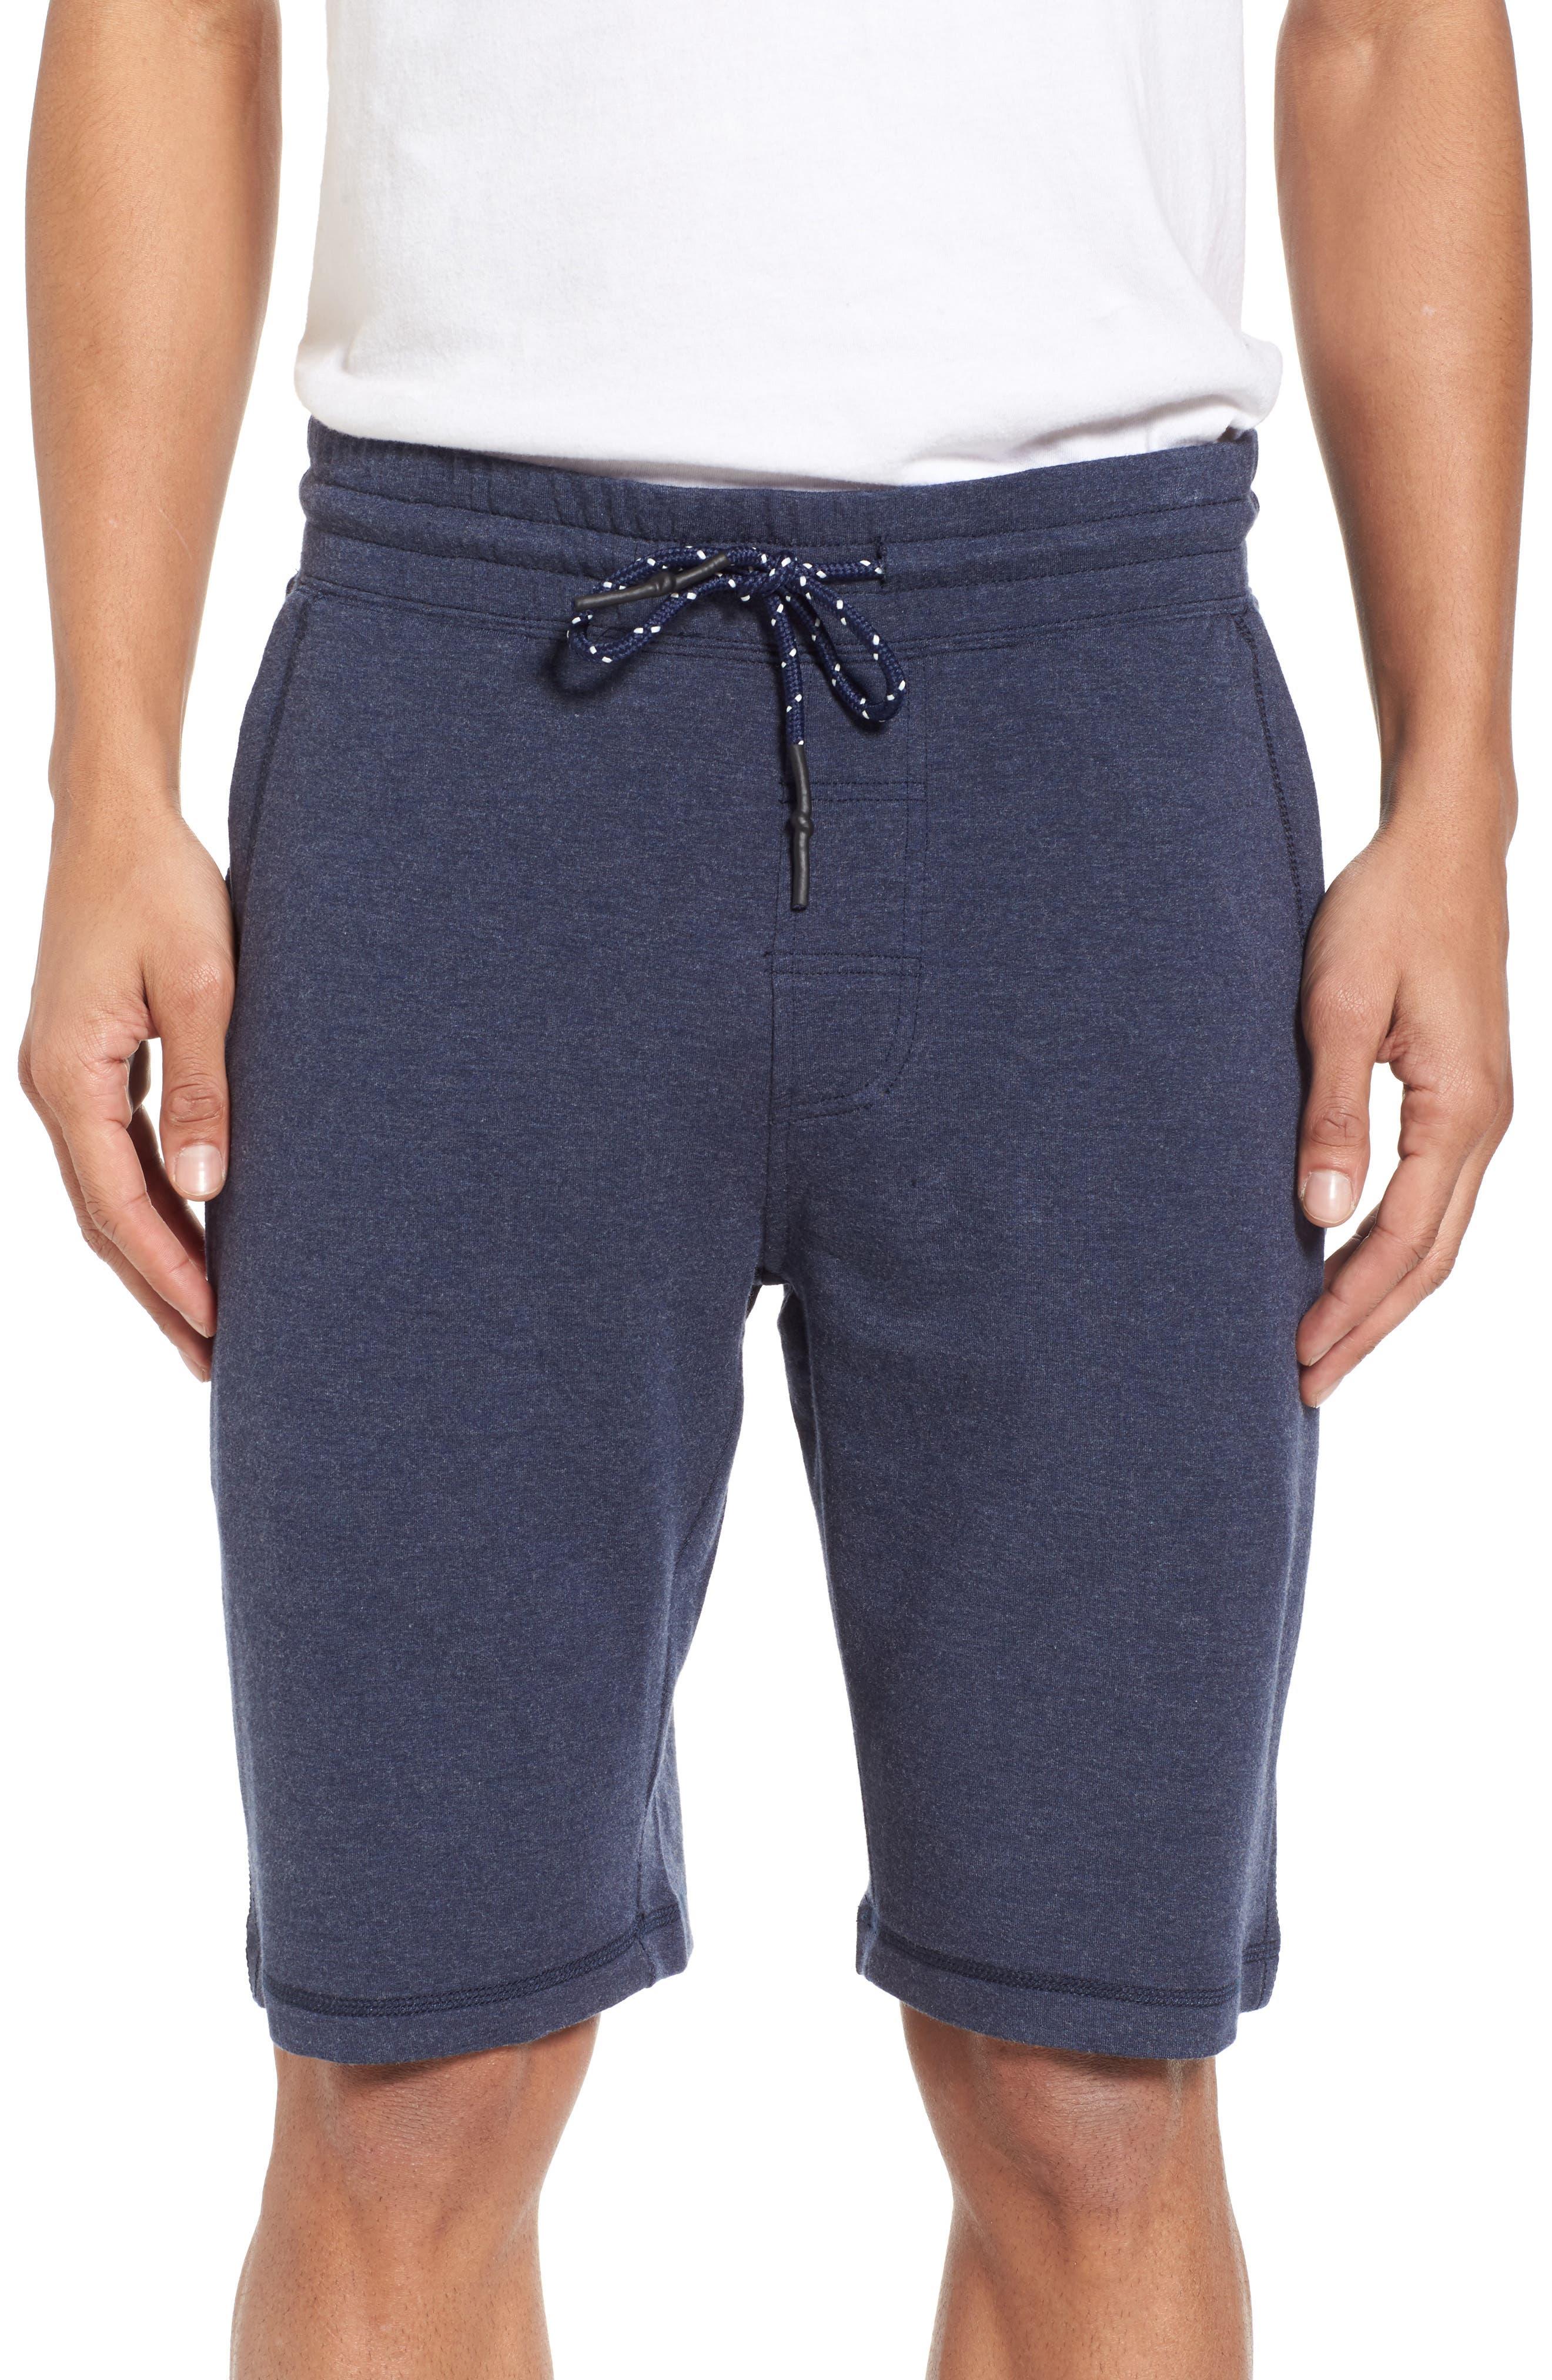 Brushback Fleece Shorts,                         Main,                         color, Navy Heather